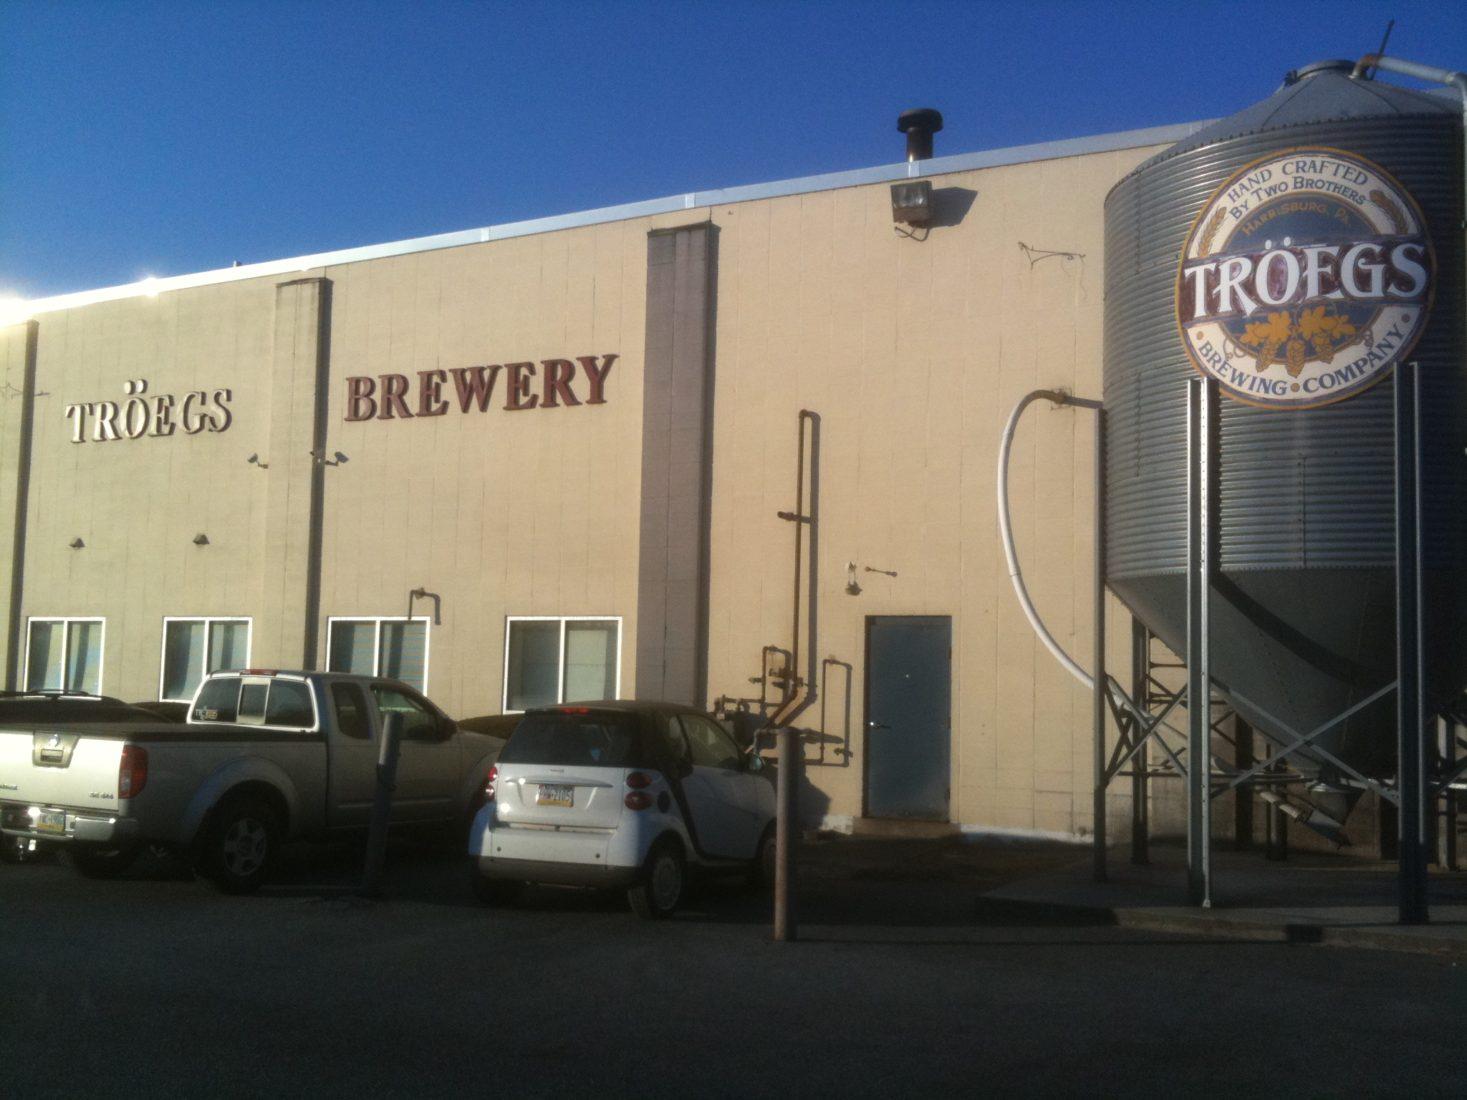 69. Troeg's (Old) Brewery, Harrisburg PA 2006